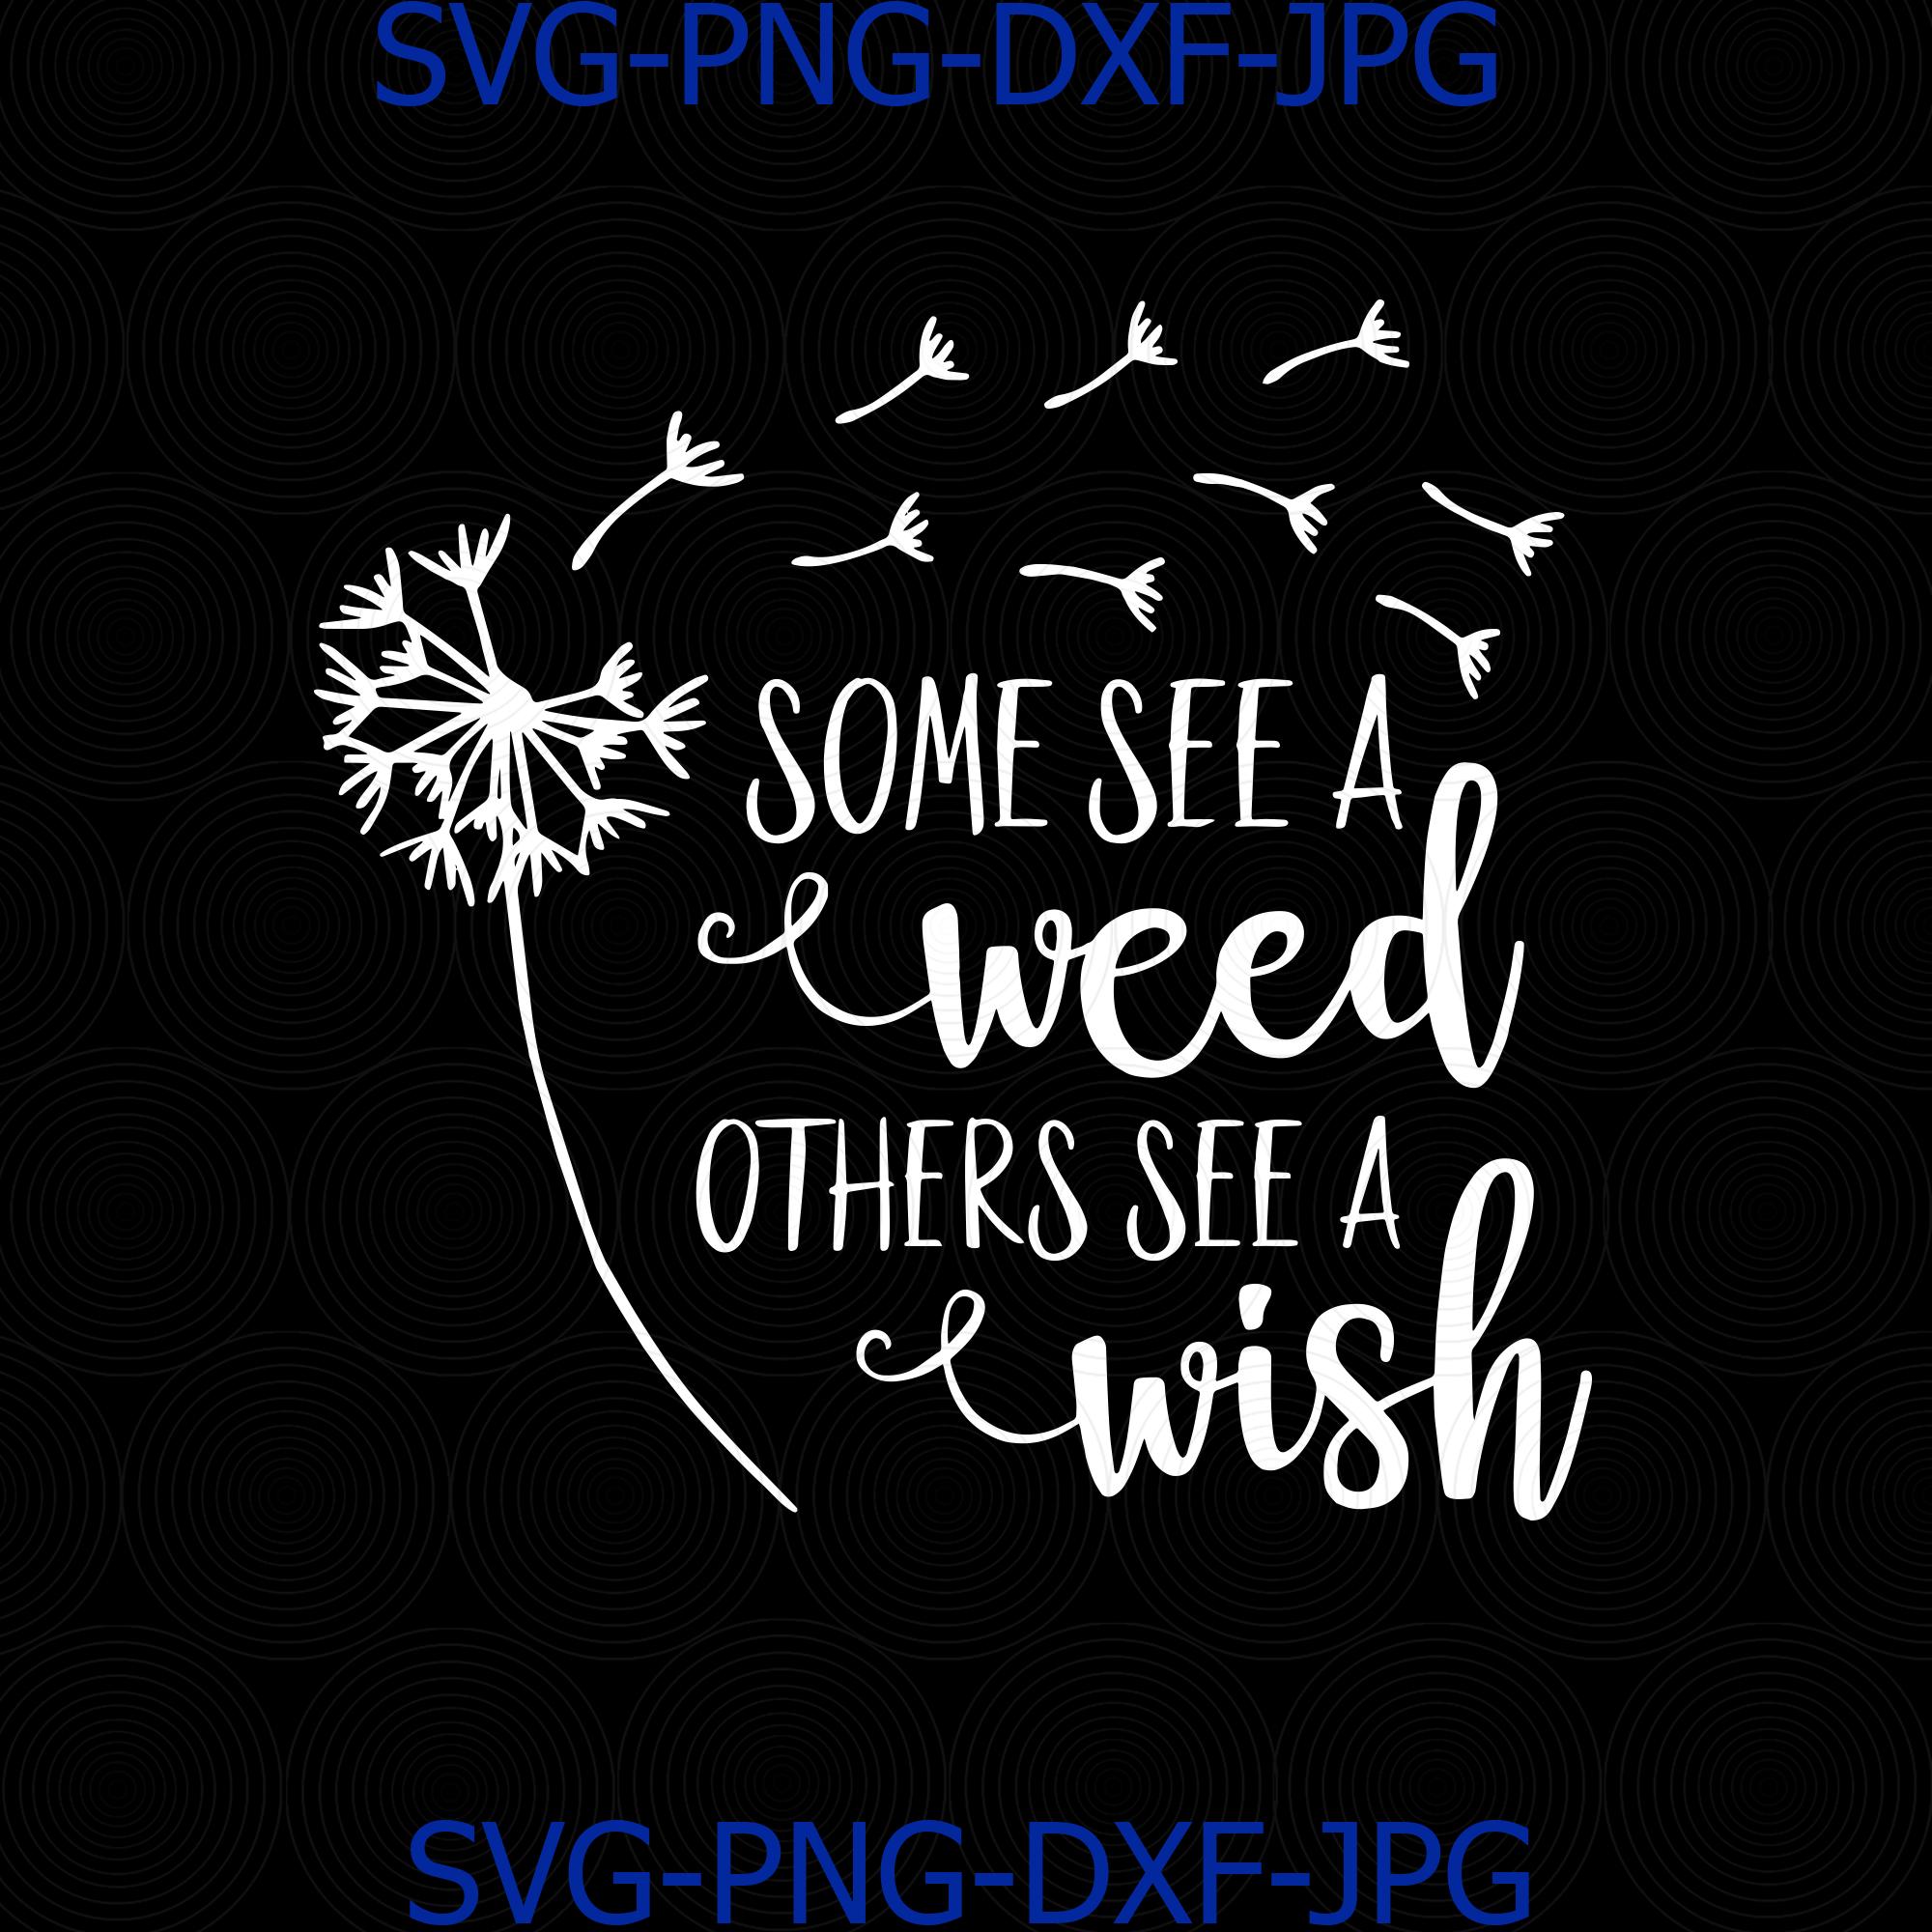 Dandelion Weed Or Wish Digital Svg Dandelion By Digital4u On Zibbet